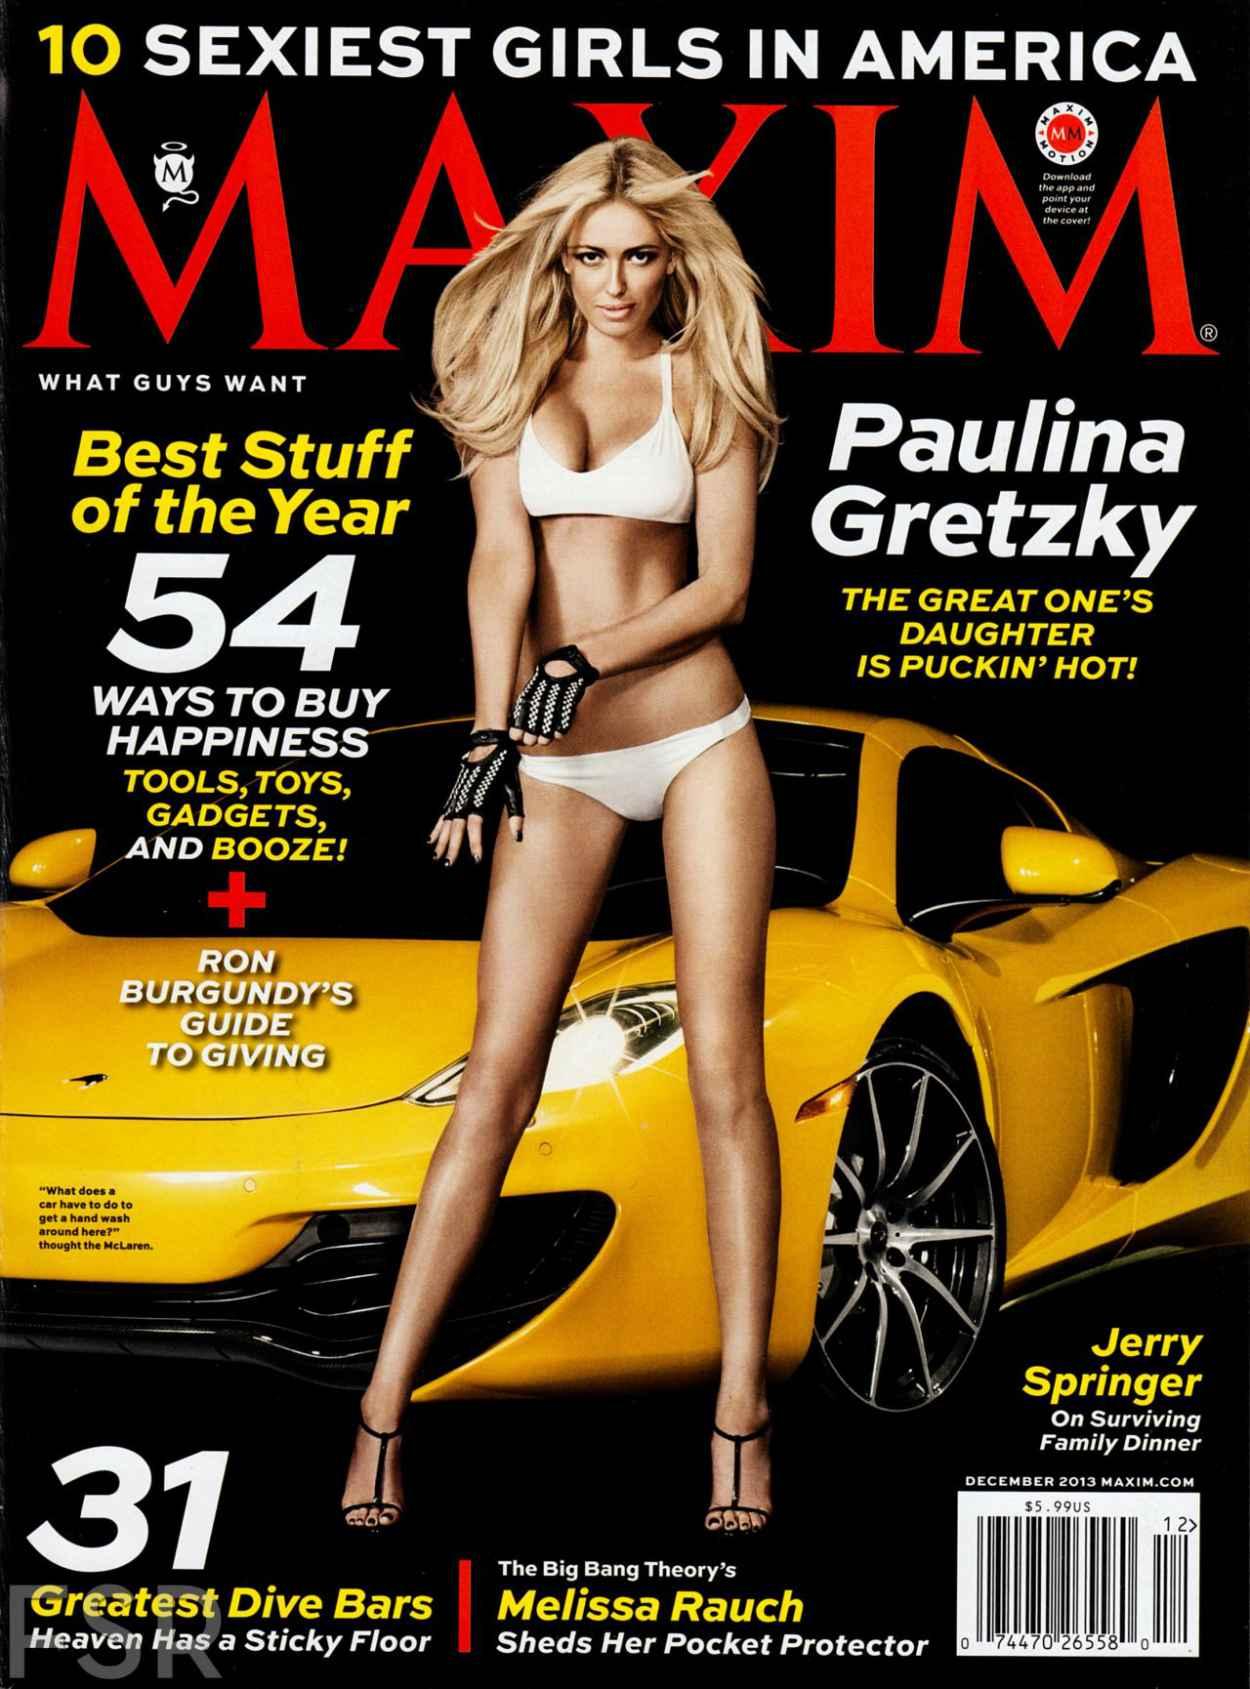 Paulina Gretzky Cover Girl - MAXIM Magazine - December 2015 Issue-1